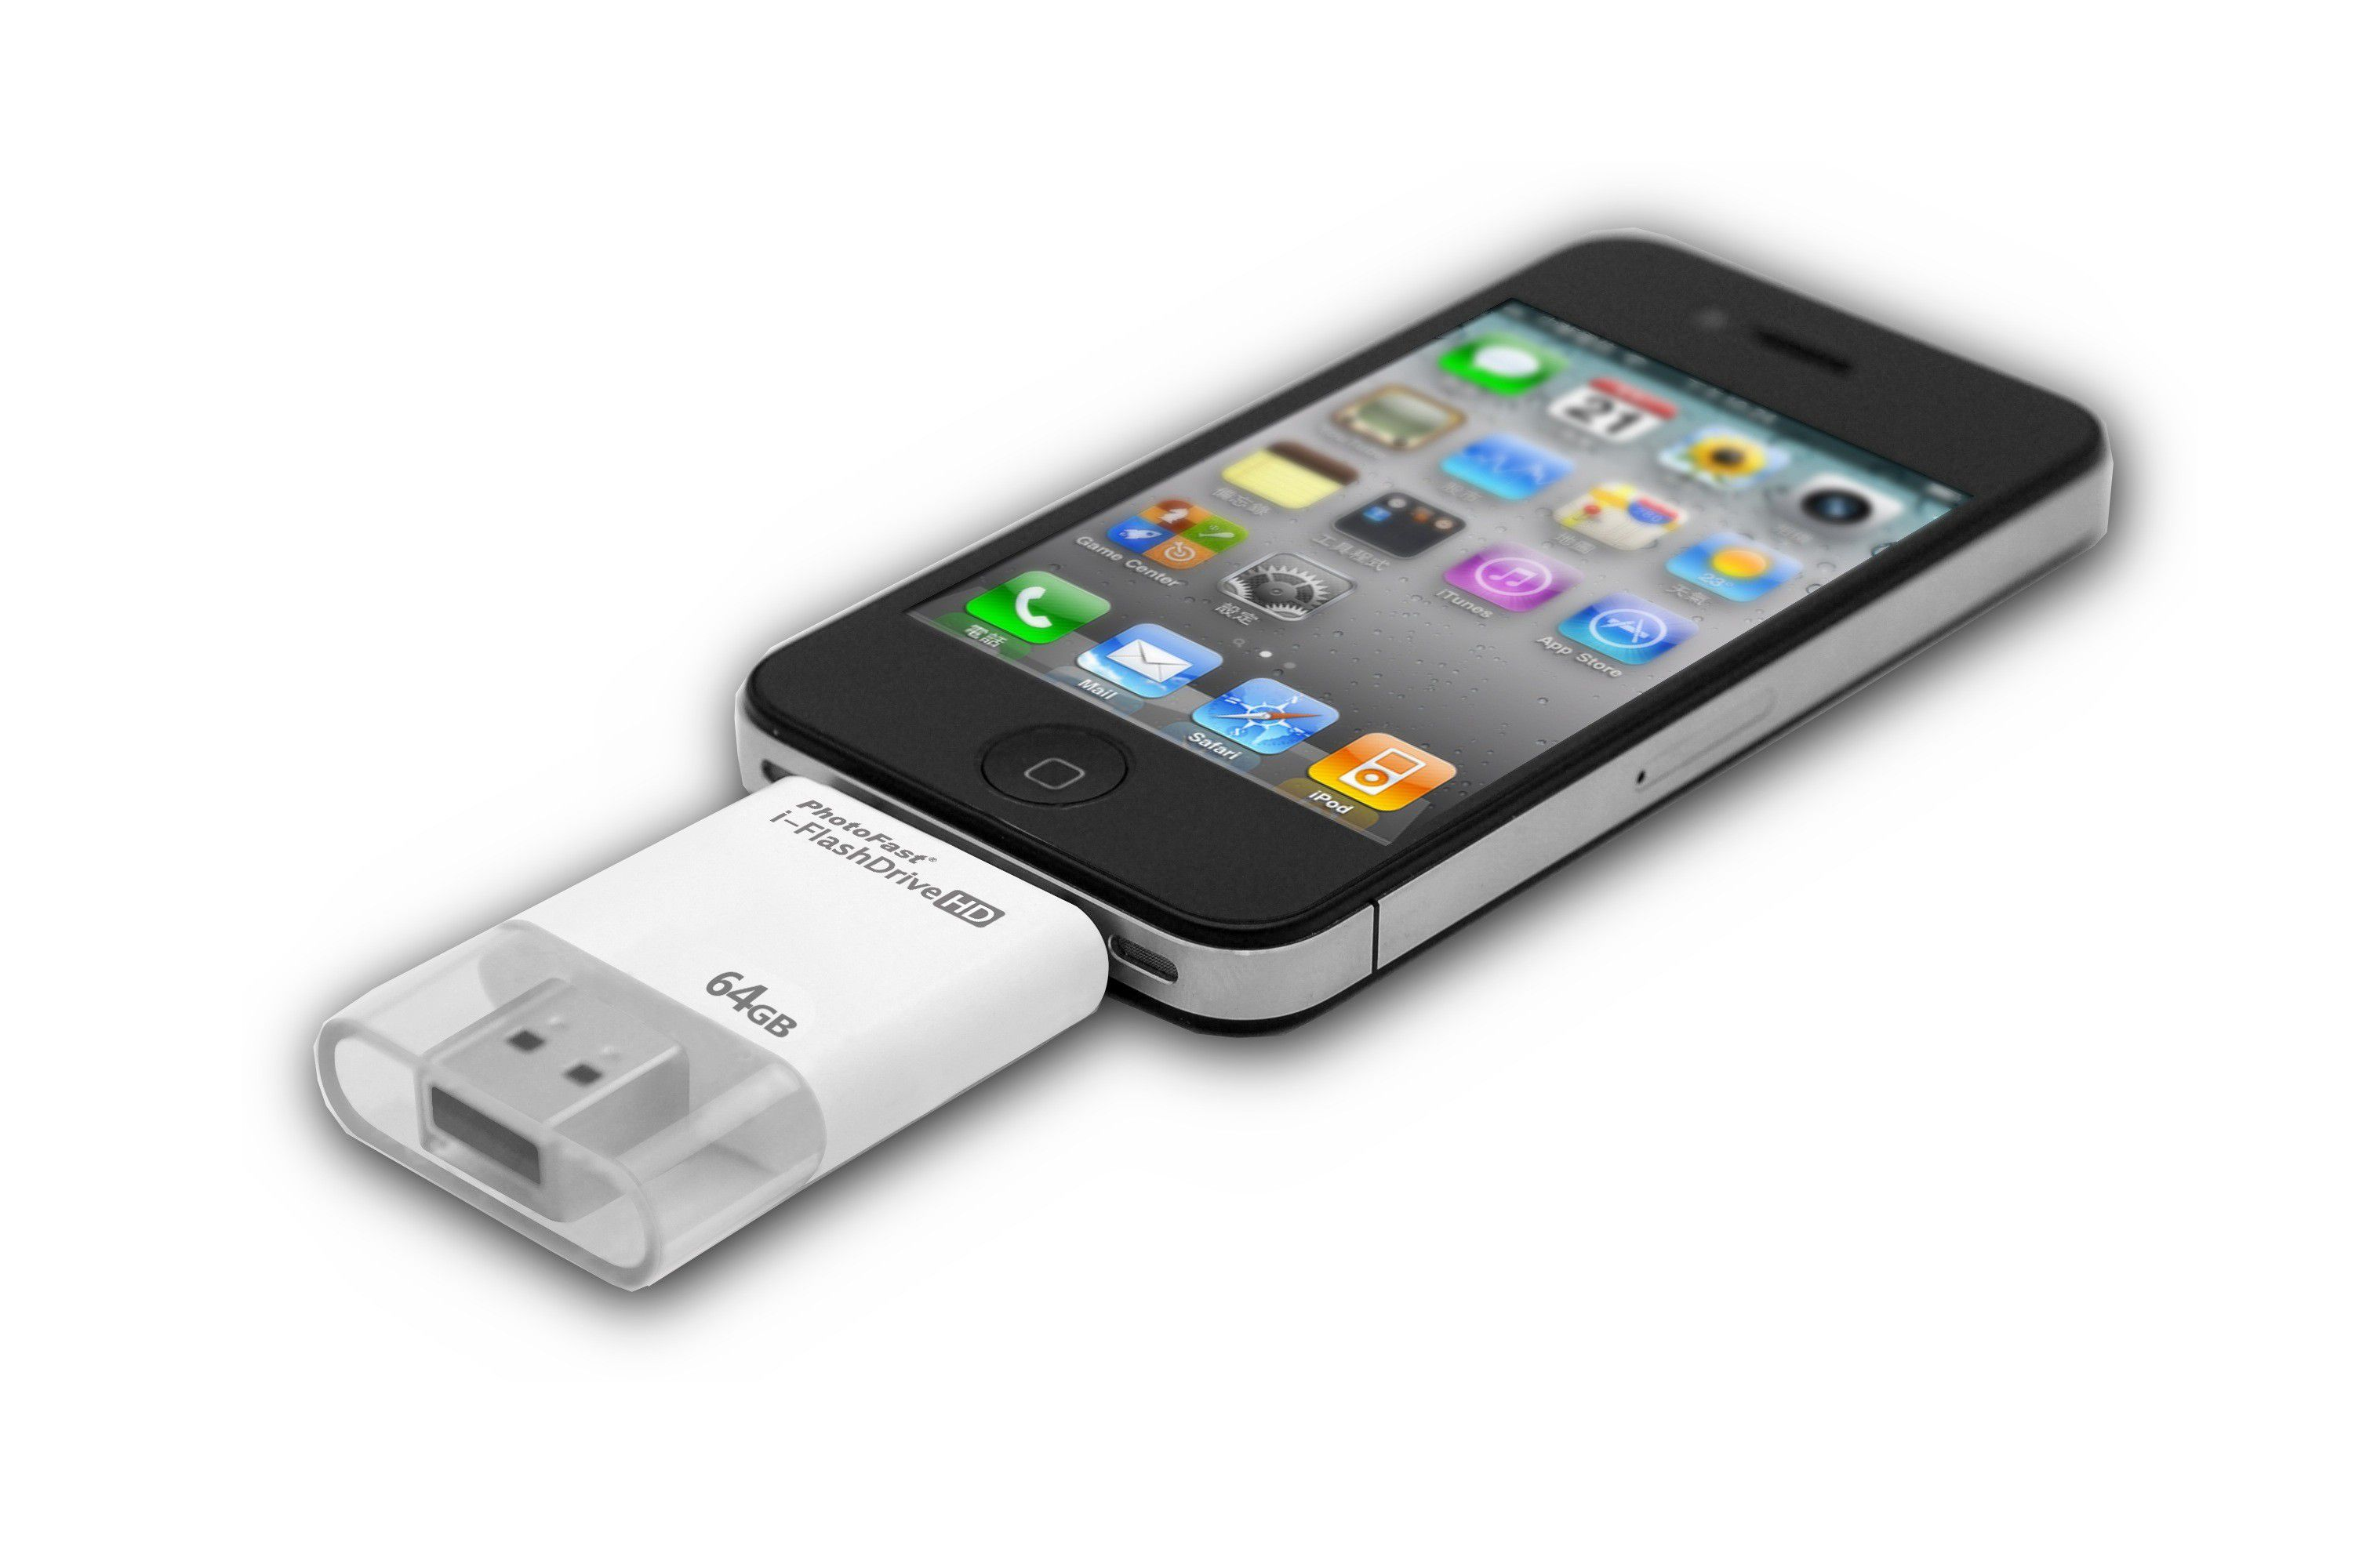 Ipad Iphone Hd: Test: Photofast I-Flashdrive HD